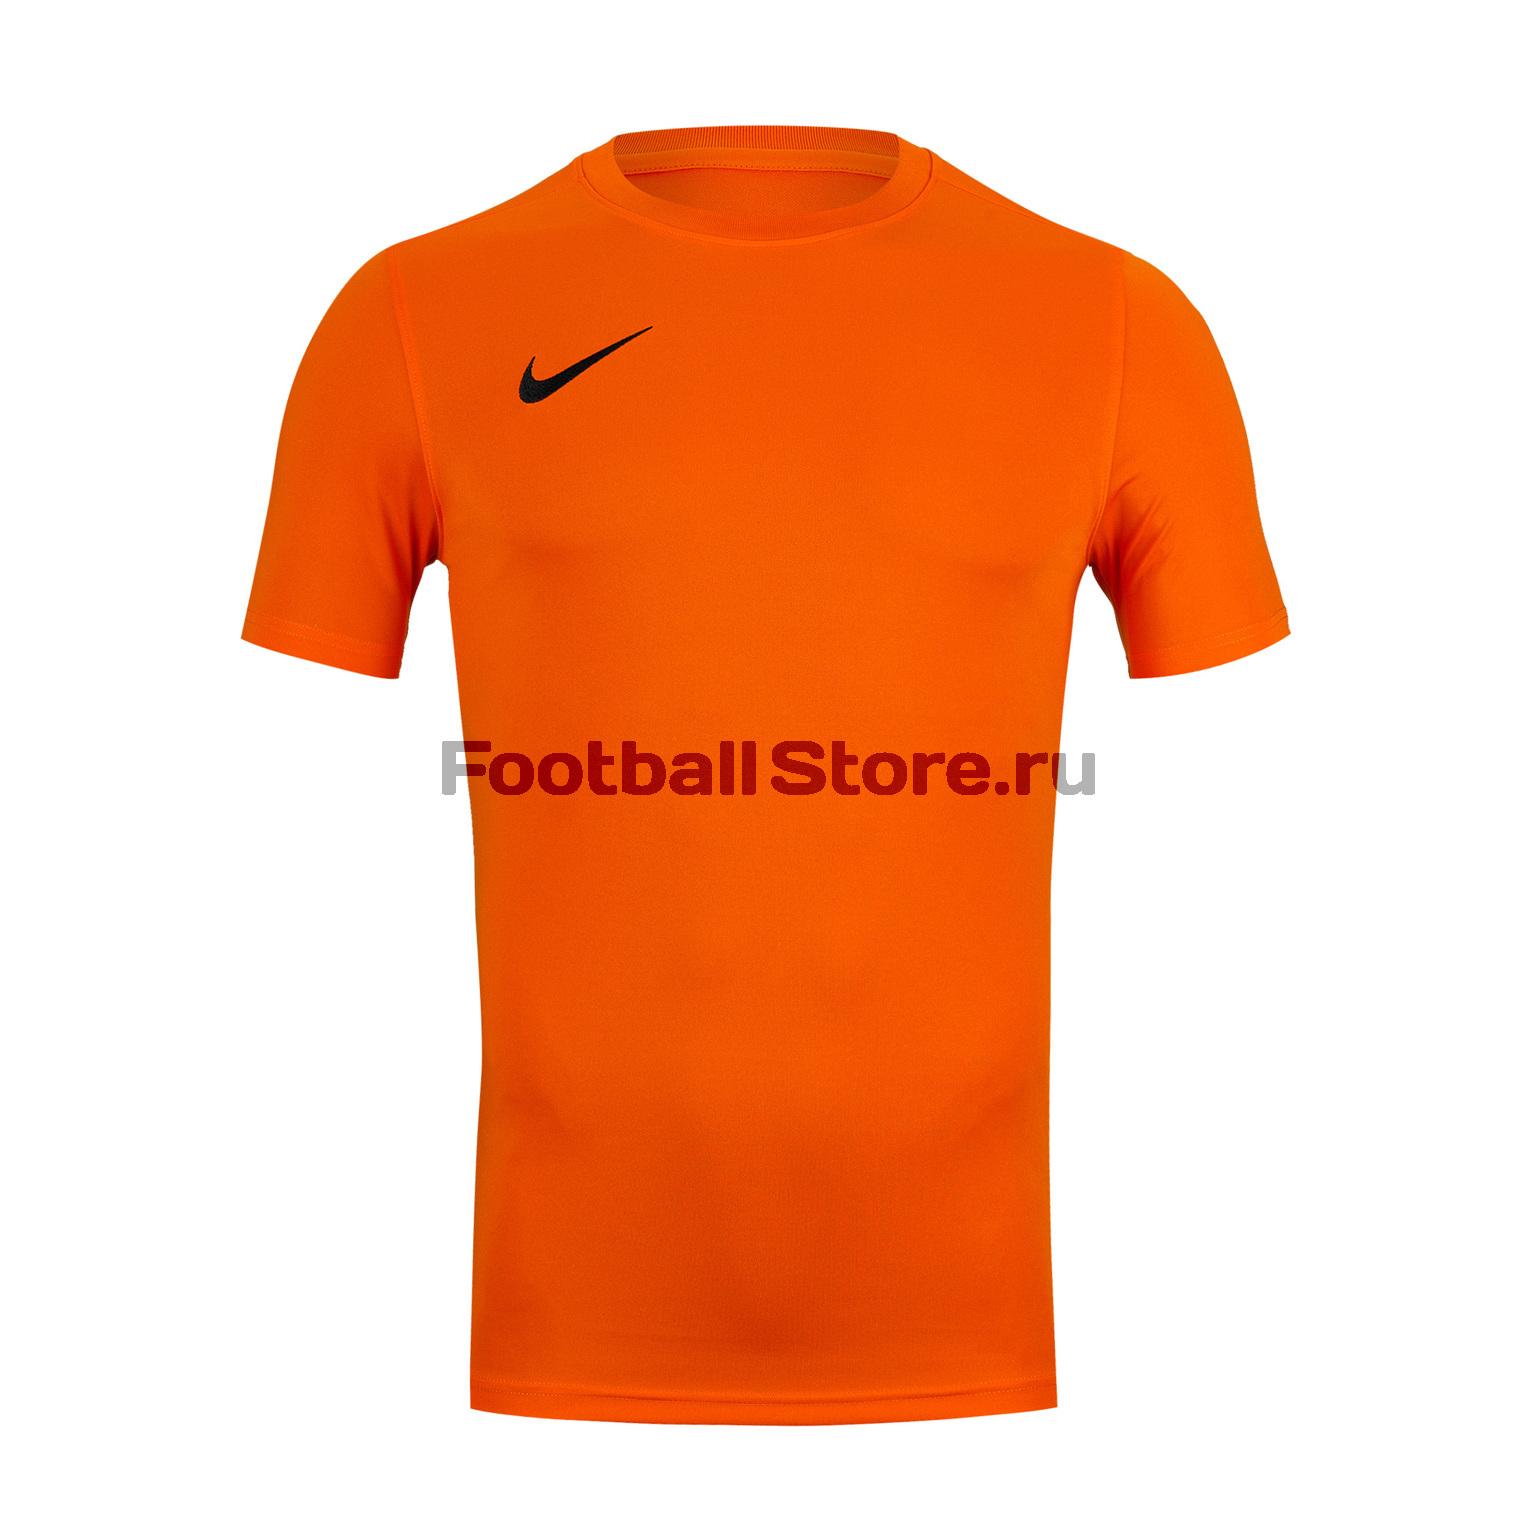 Футболка игровая Nike Dry Park VII BV6708-819 цена и фото